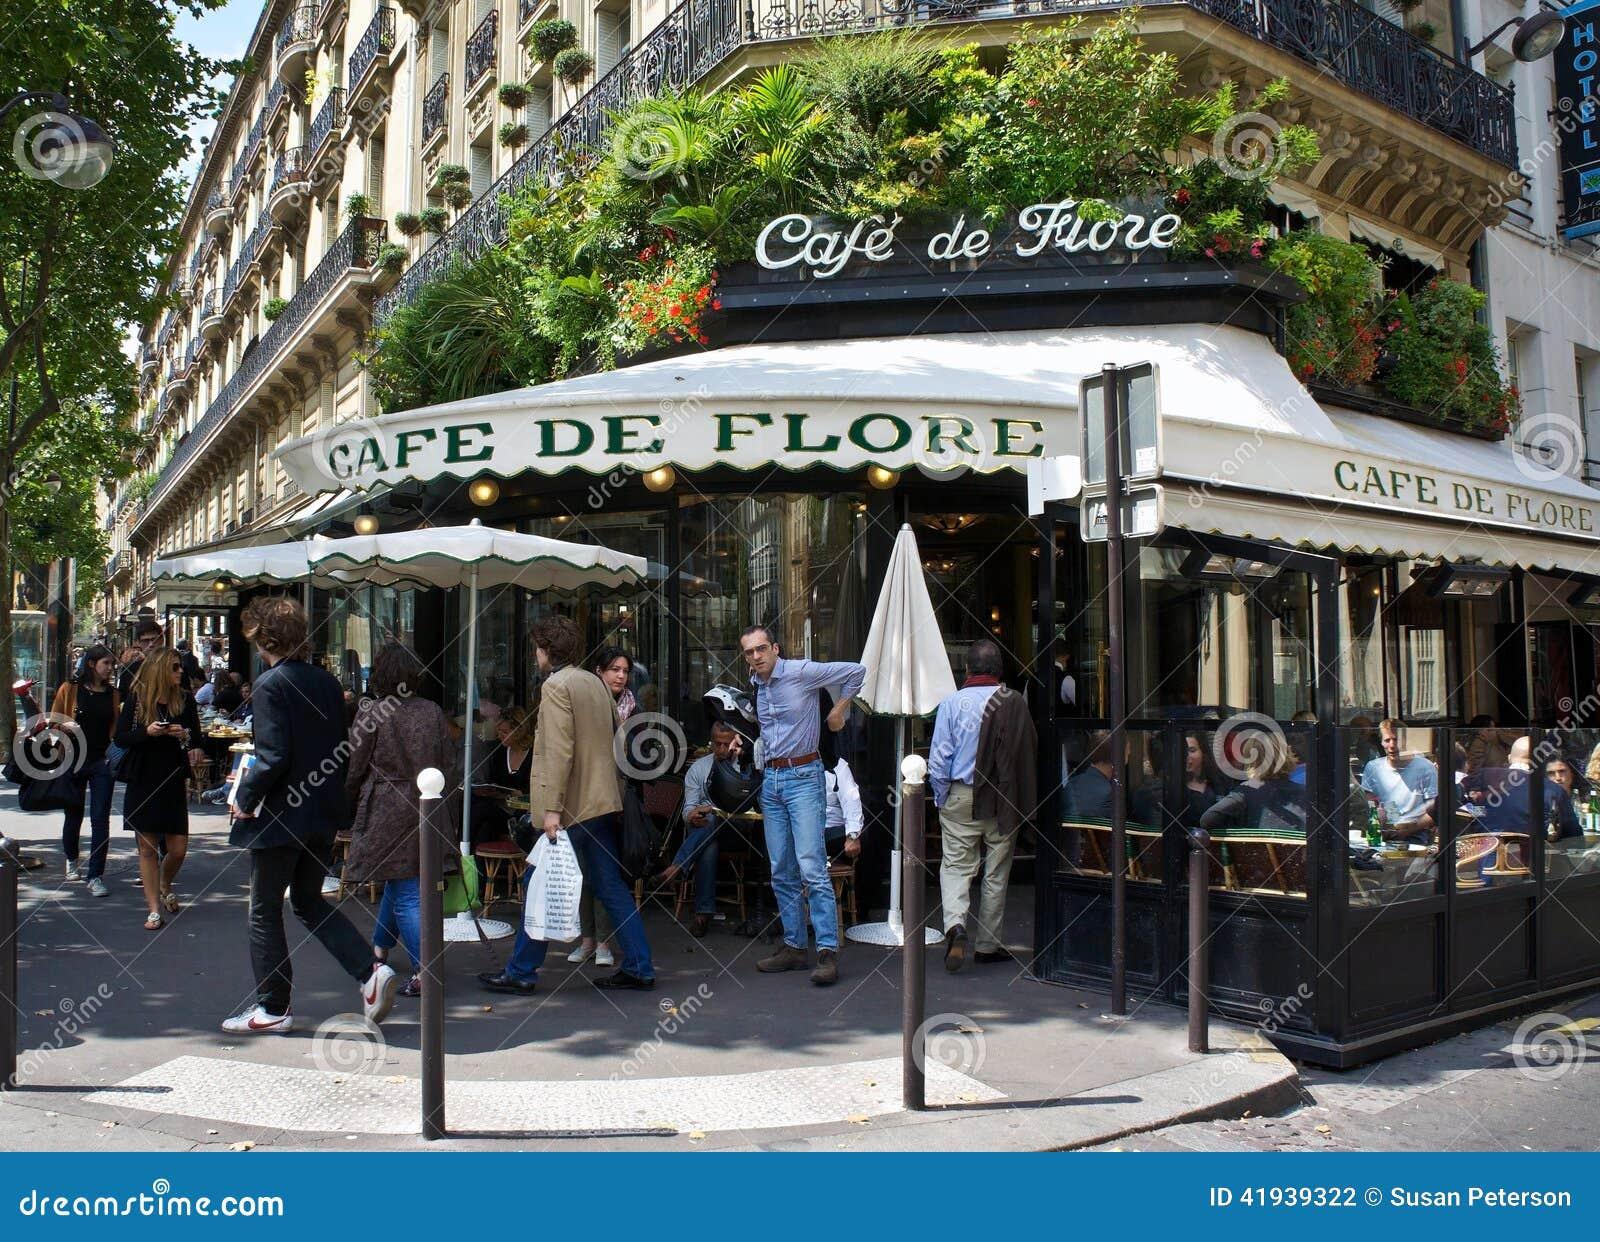 Caf de paris photographie ditorial image 41939322 - Camif paris ...